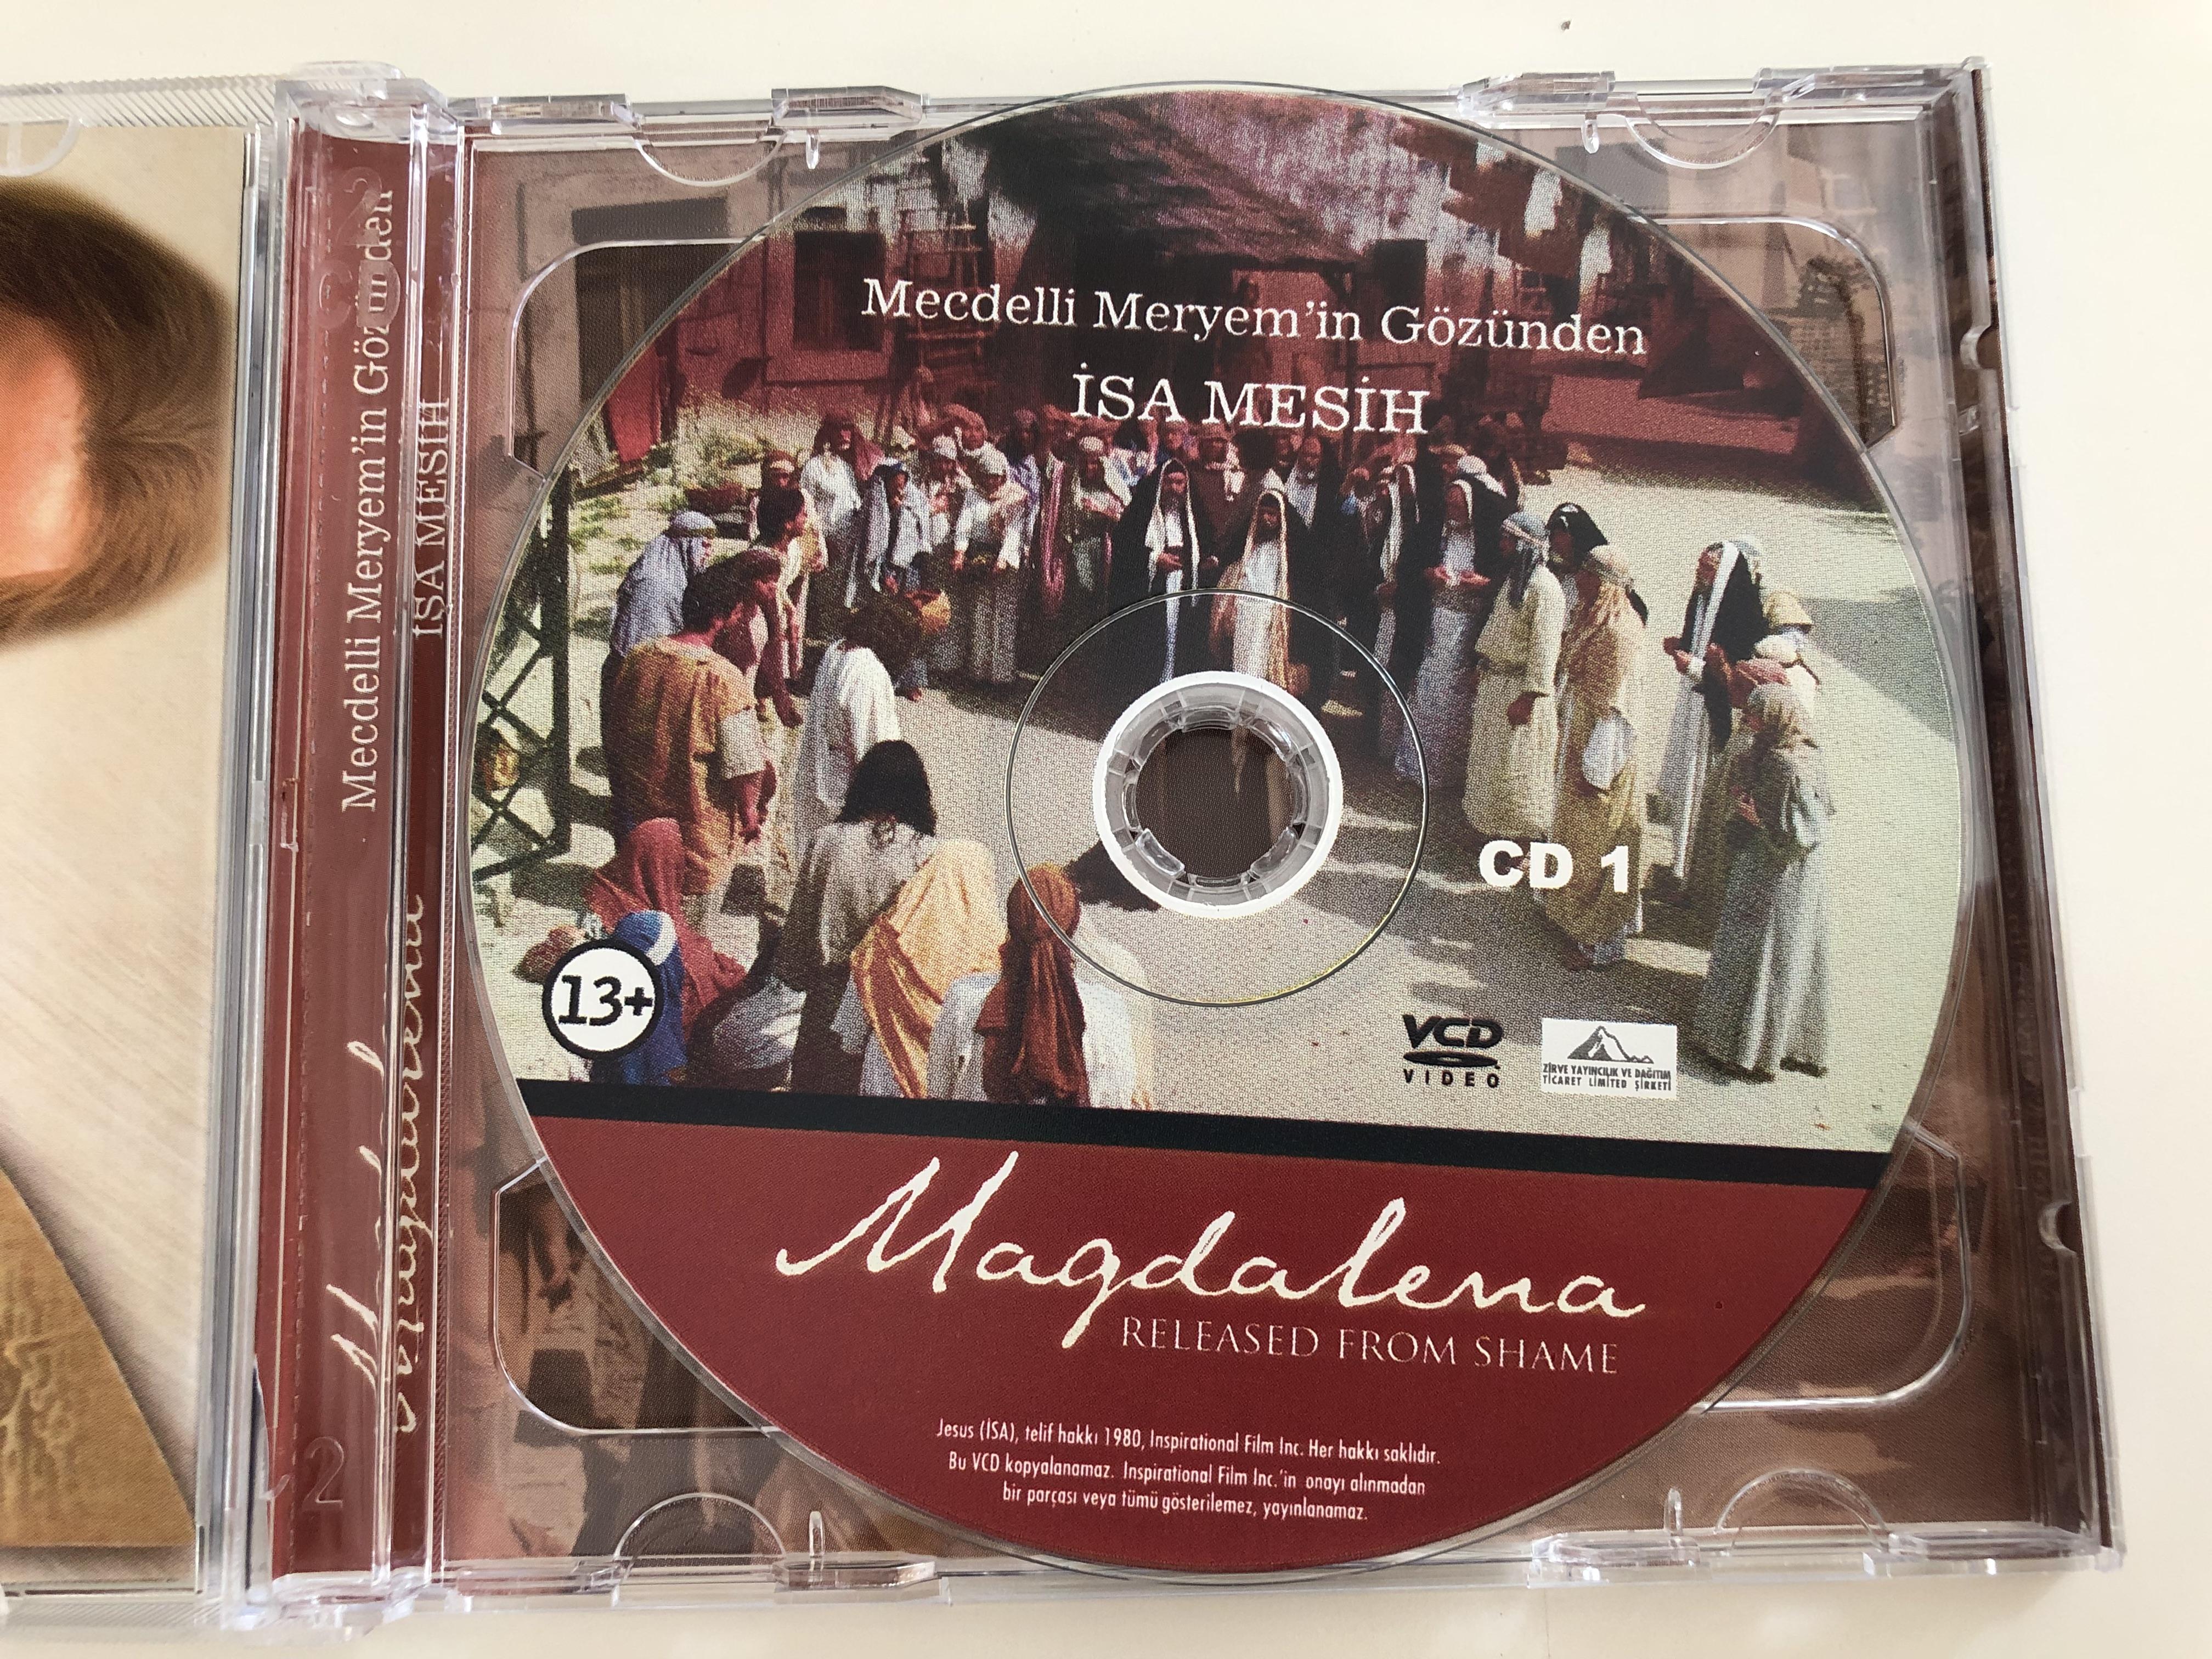 magdalena-released-from-shame-2x-vcd-1980-mecdelli-meryem-in-g-z-nden-sa-mesih-directed-by-charlie-brookins-jordan-starring-brian-deacon-rebecca-ritz-gigi-orsillo-shira-lane-6-.jpg